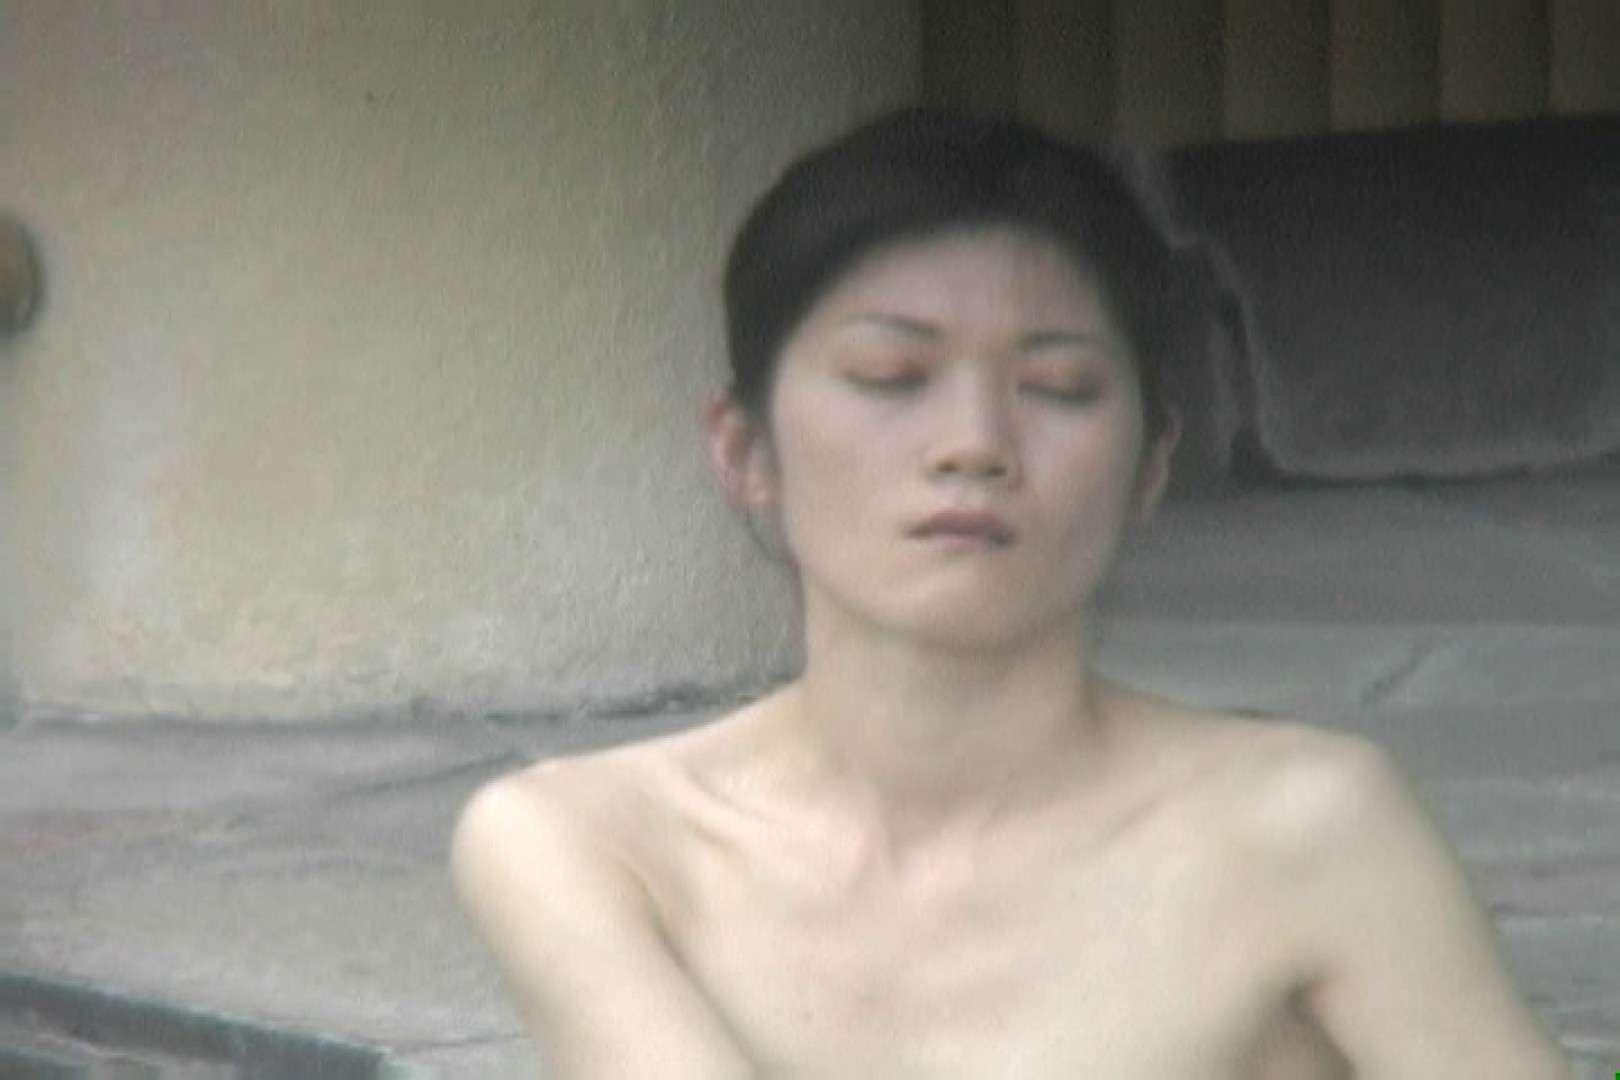 Aquaな露天風呂Vol.686 エッチな盗撮 盗み撮り動画 83pic 83